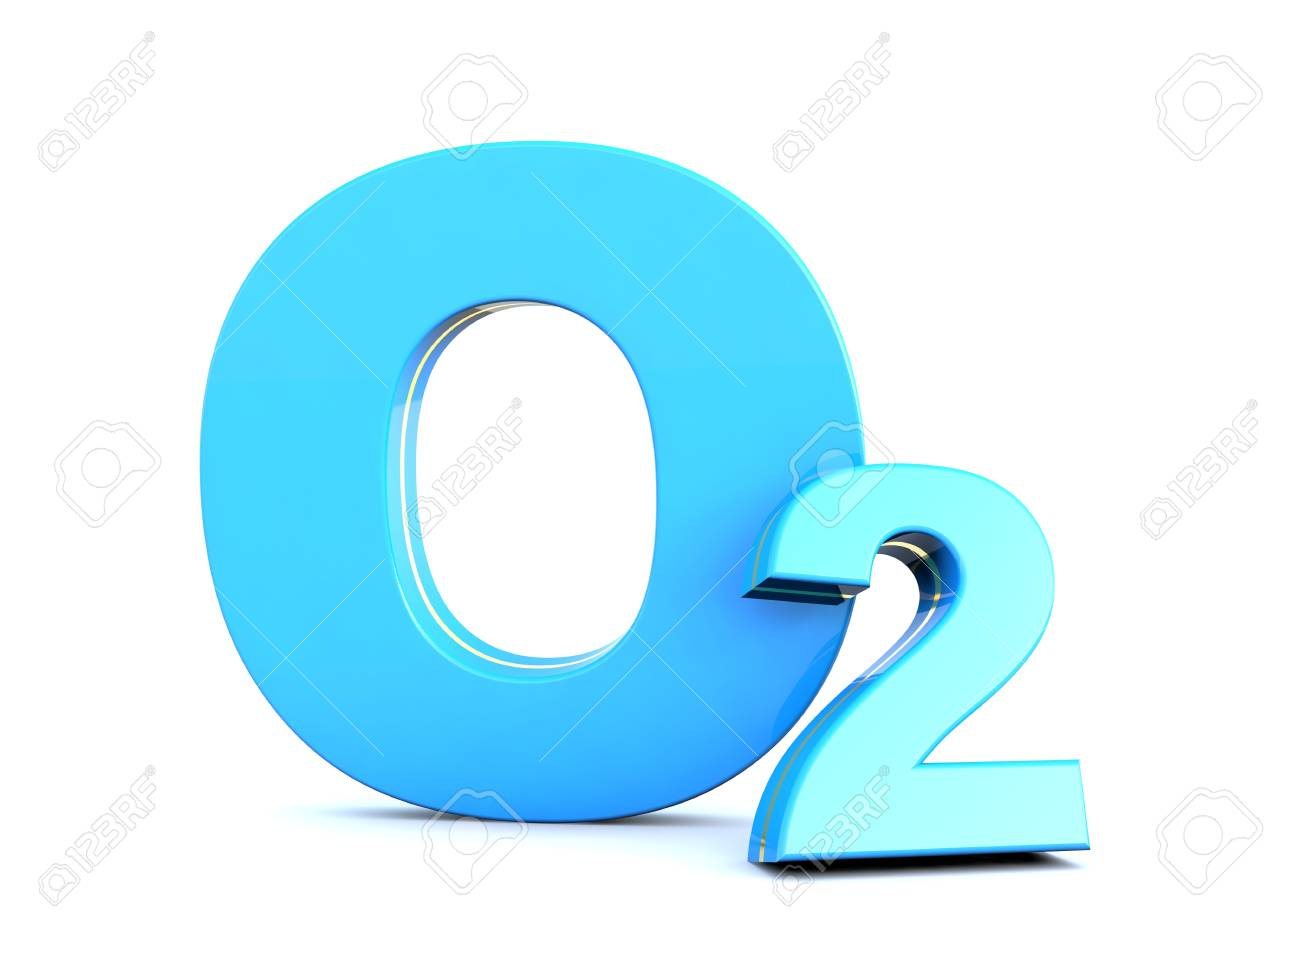 O2   Blue Oxygen Molecule Symbol On White Background Stock Photo 1300x975